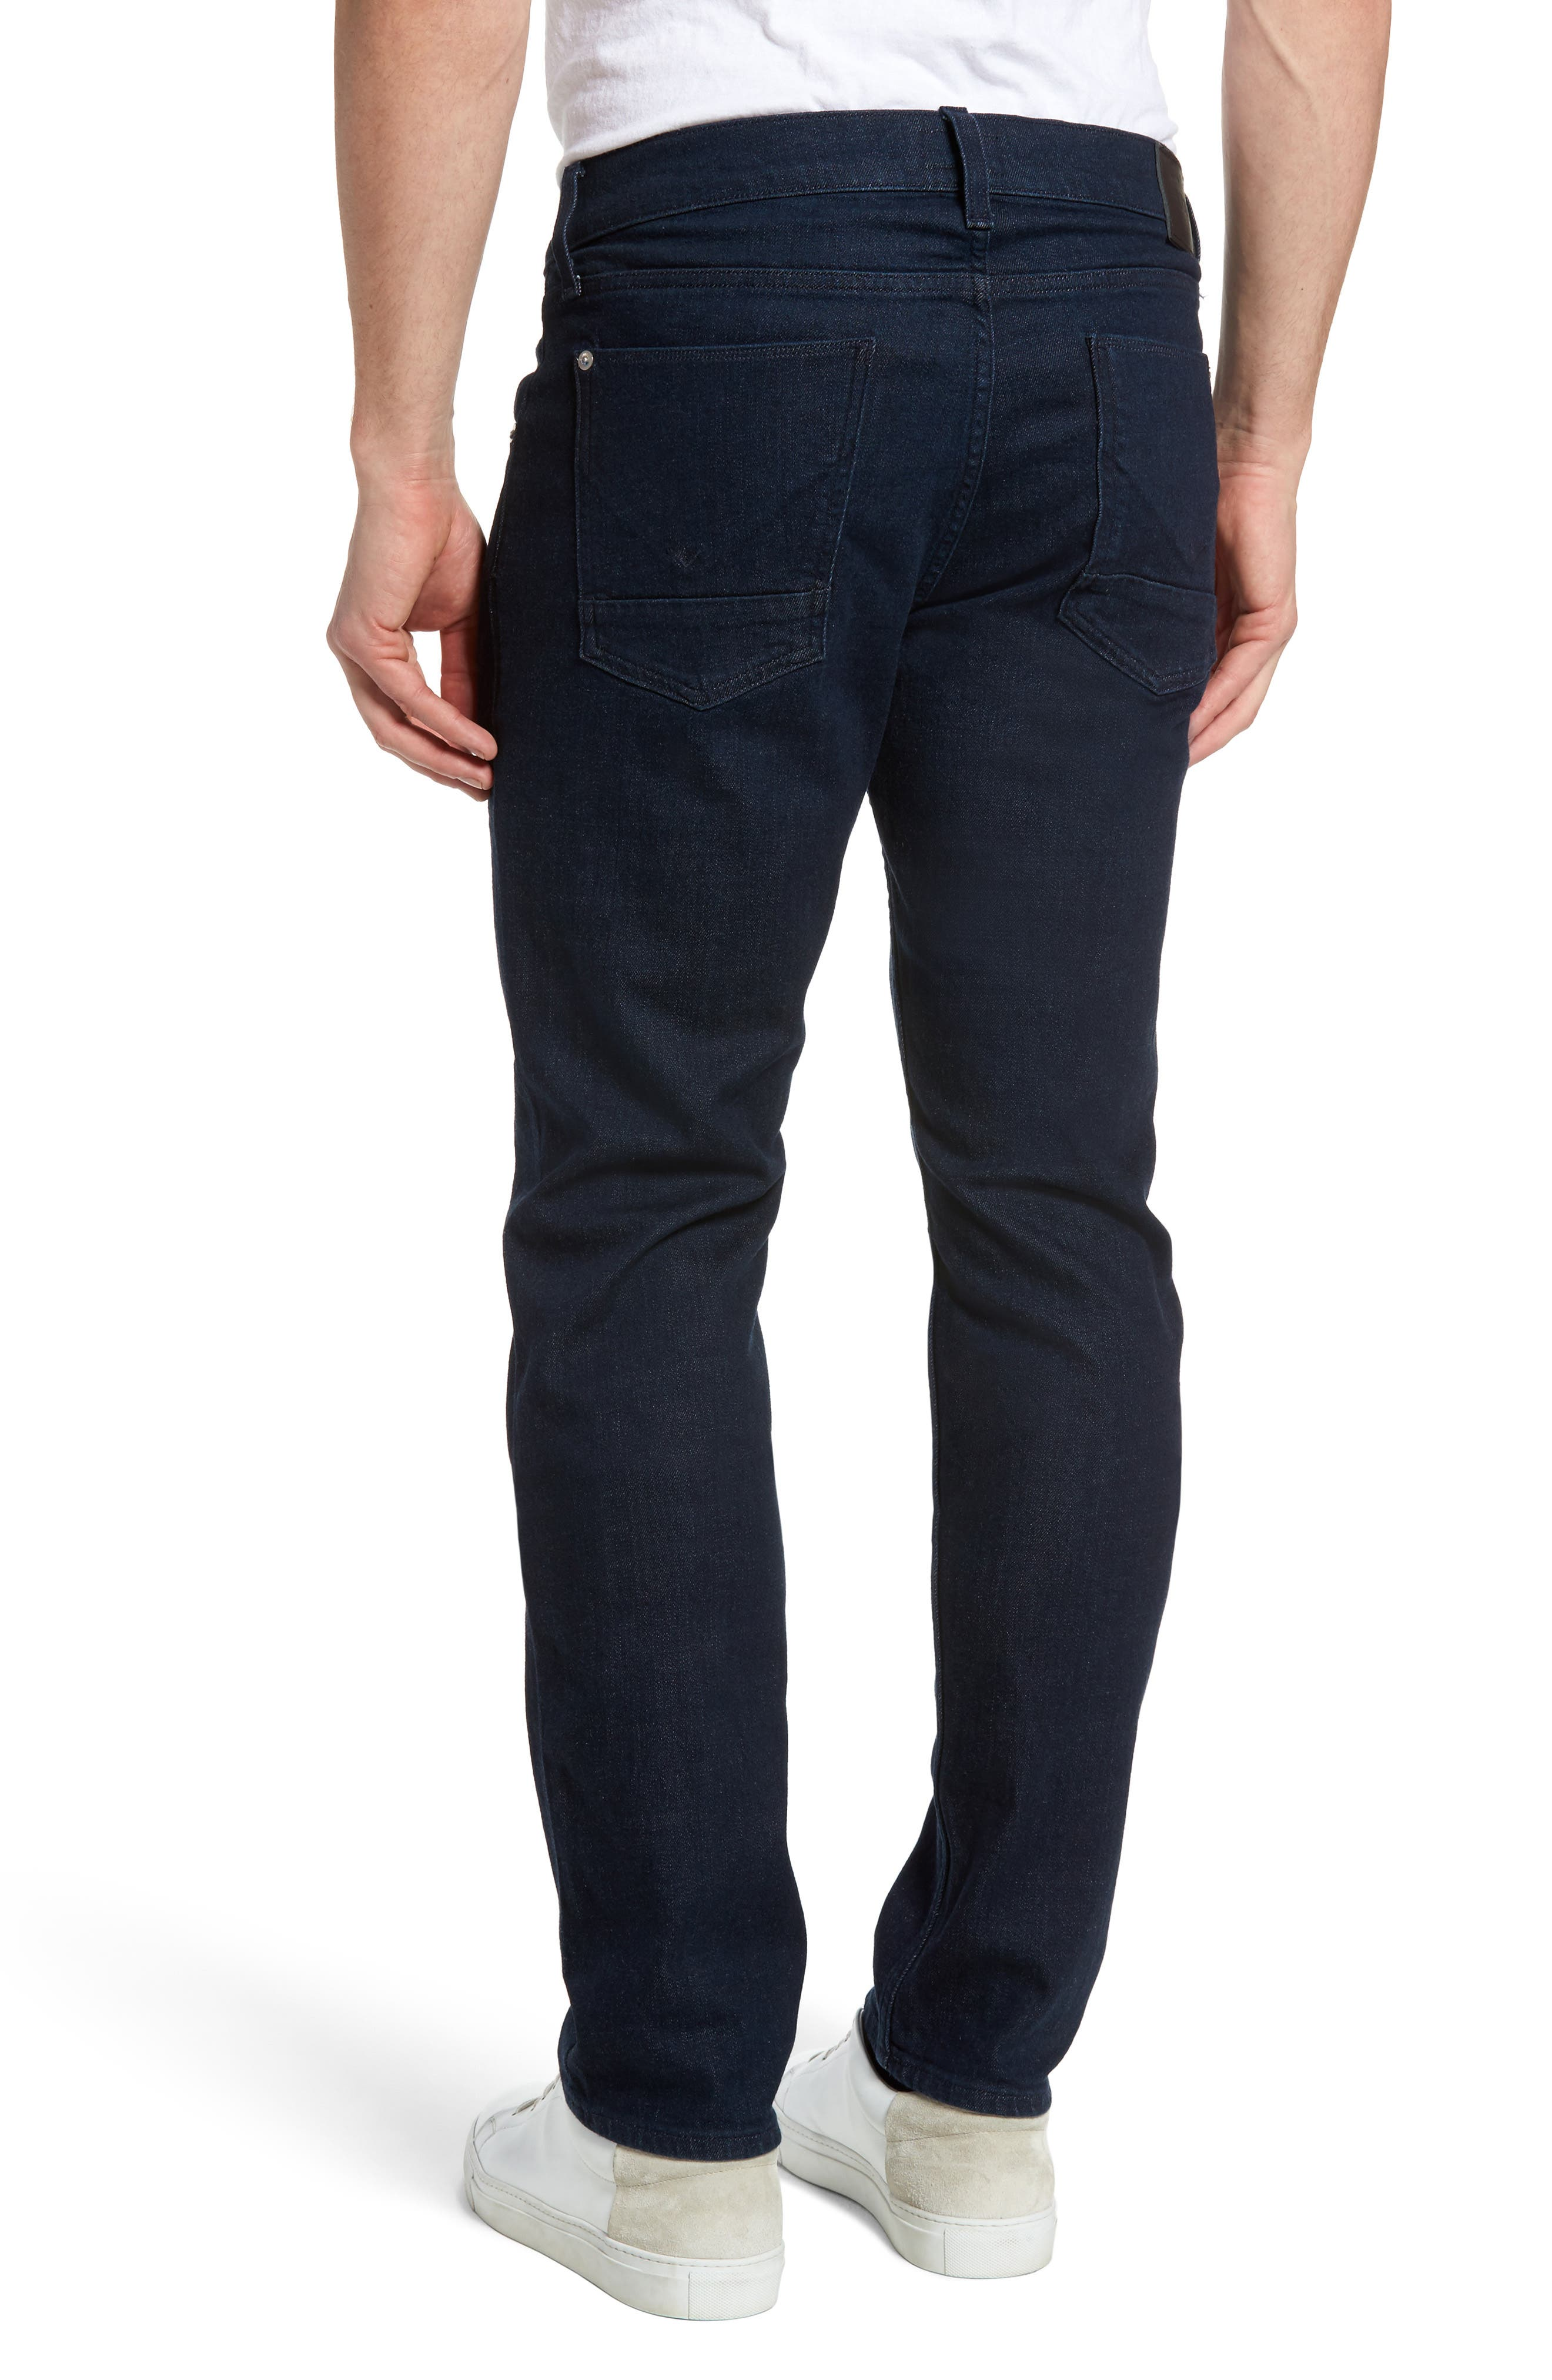 Blake Slim Fit Jeans,                             Alternate thumbnail 2, color,                             Firebrand